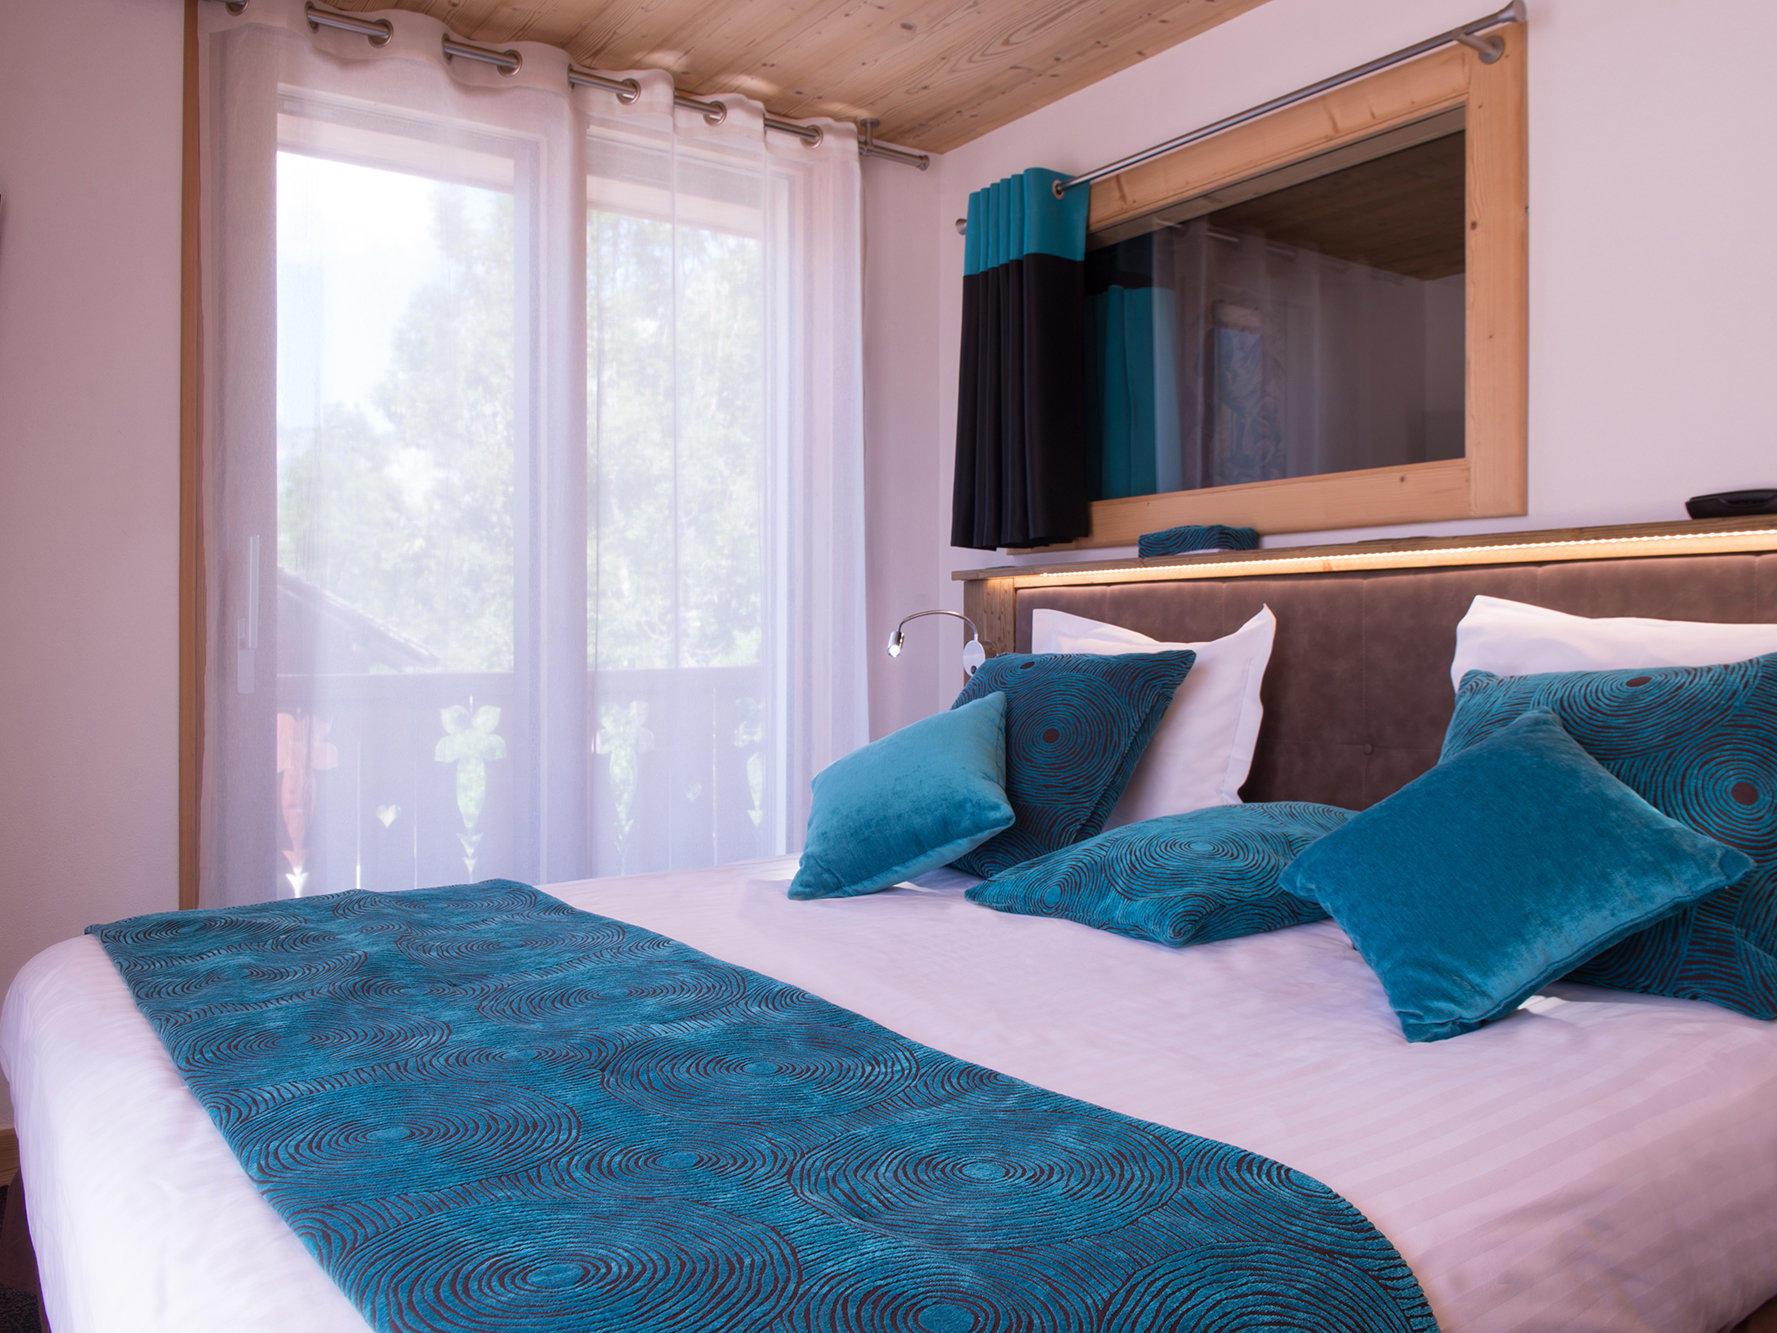 chambre famille communicante lit hotel gentianettes, the originals